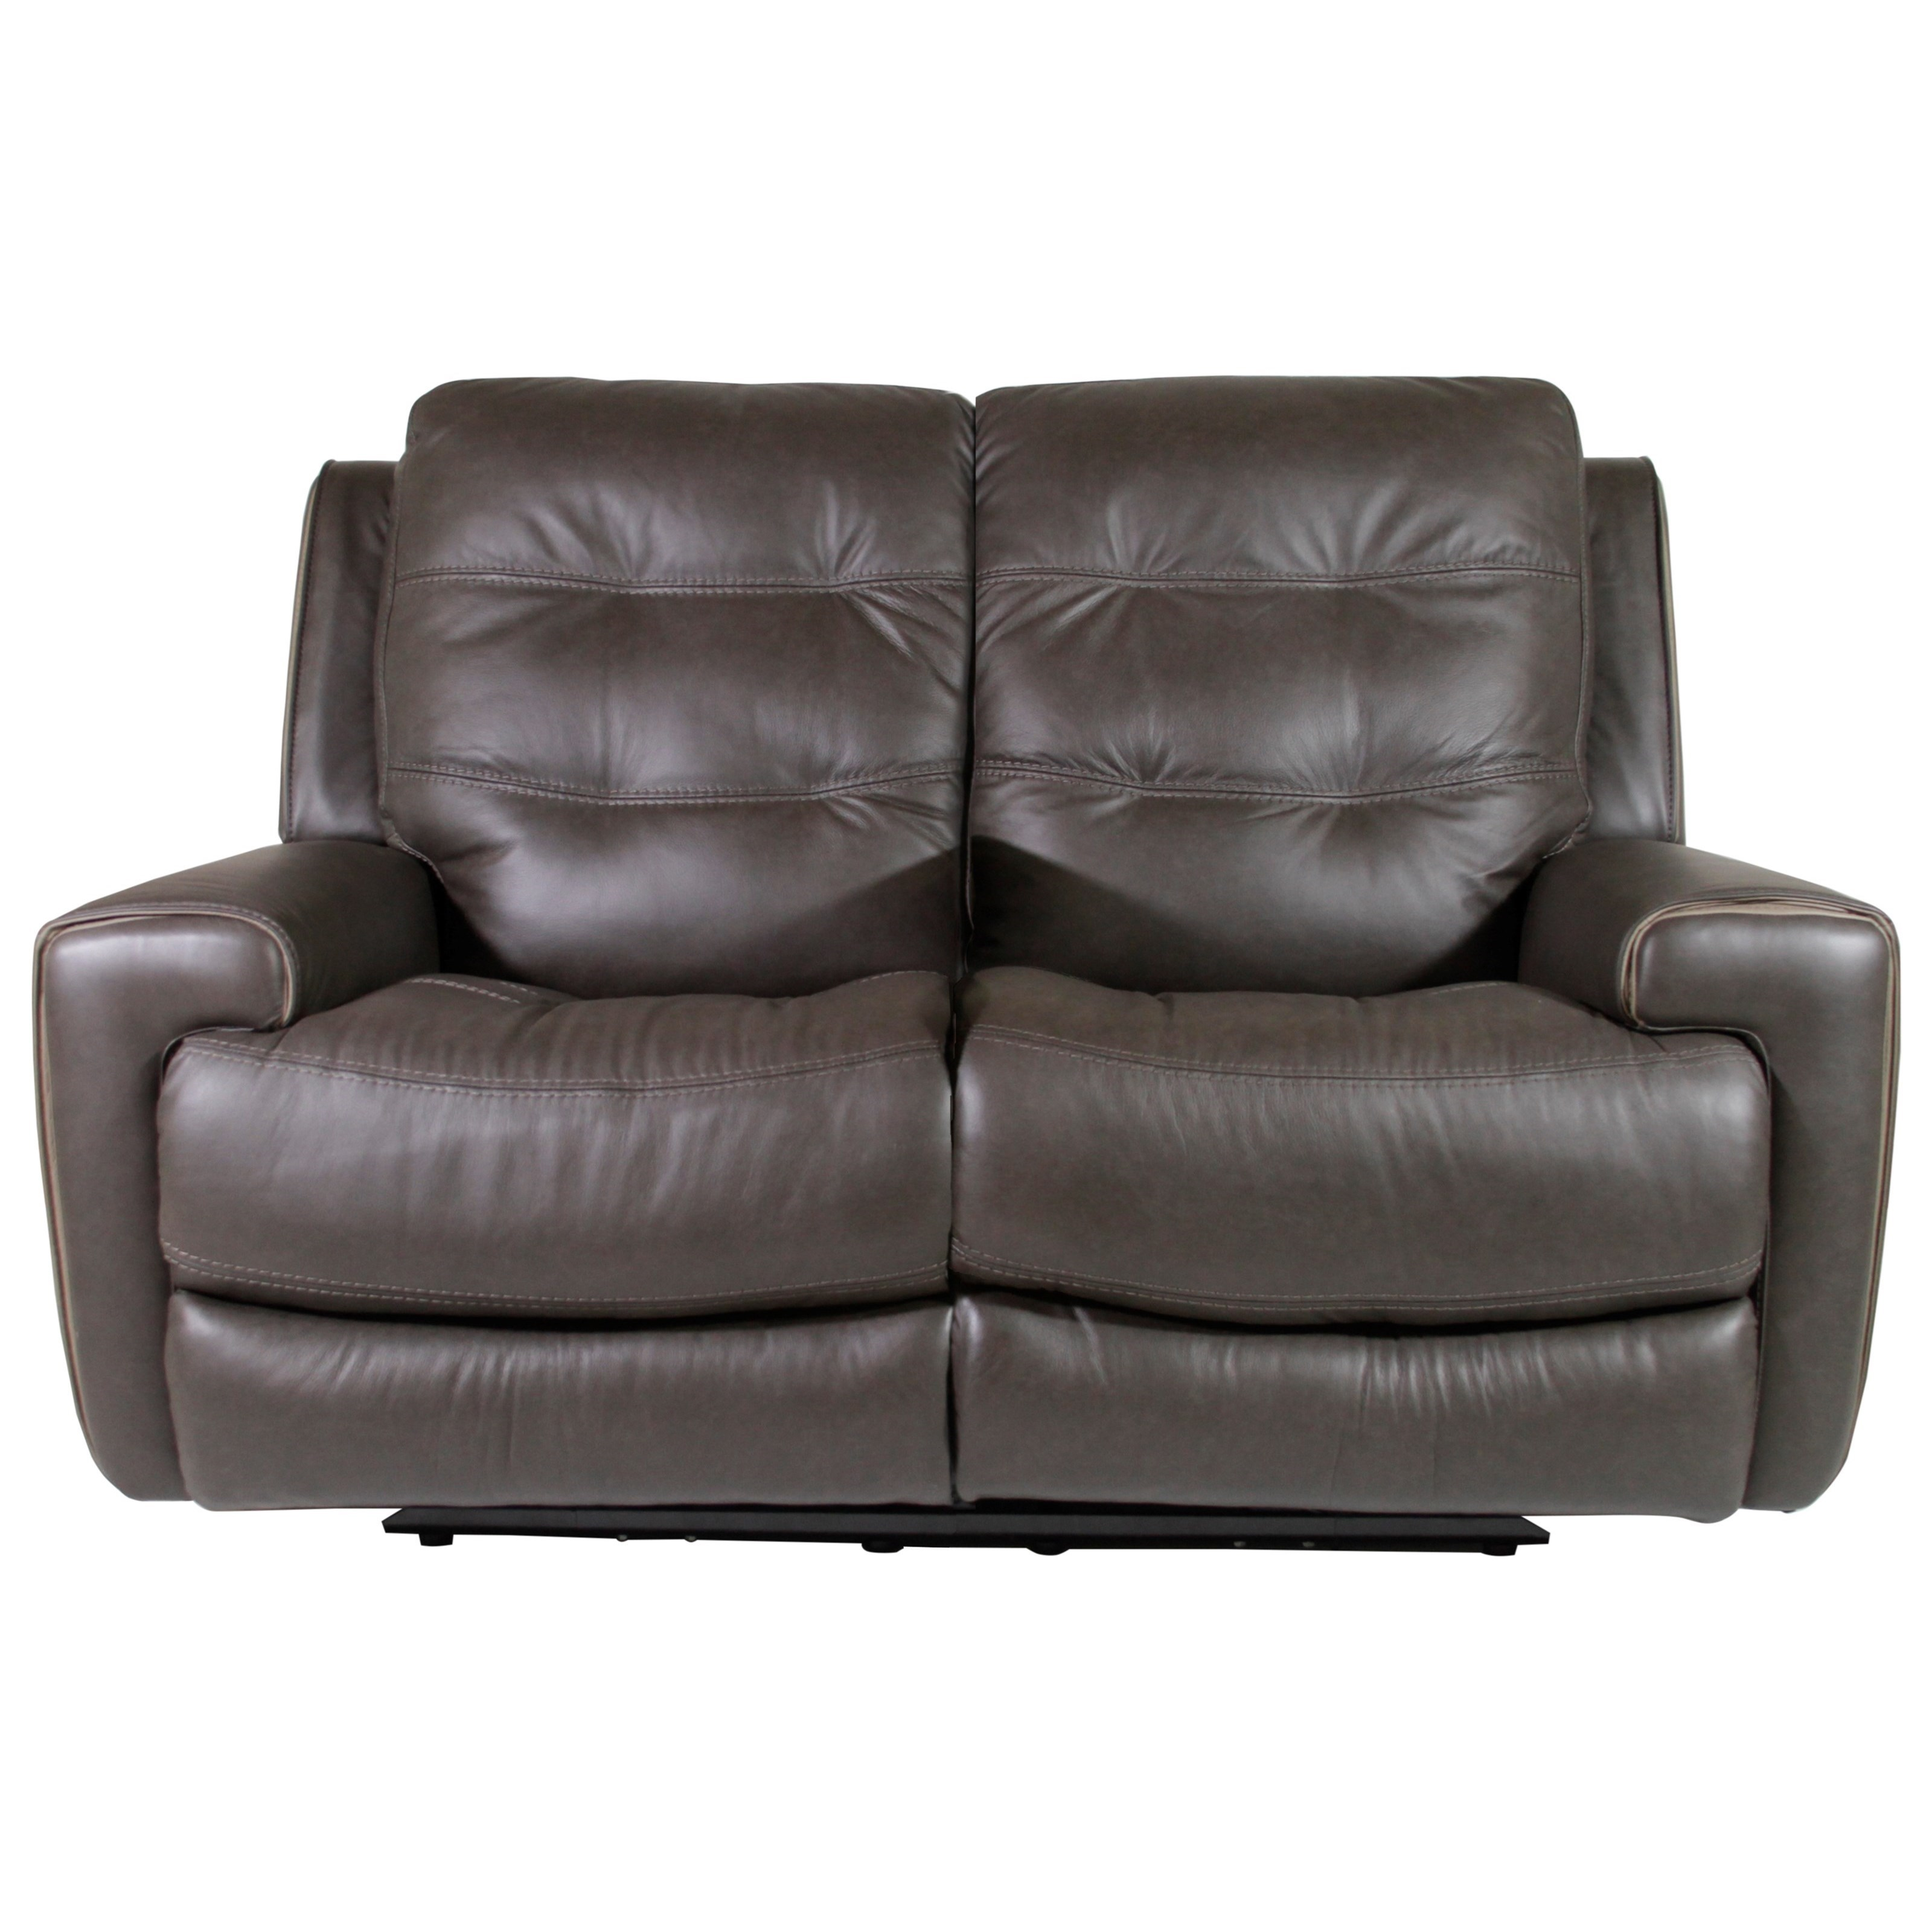 Latitudes-Wicklow Power Reclining Loveseat with Power Headrest by Flexsteel at Mueller Furniture